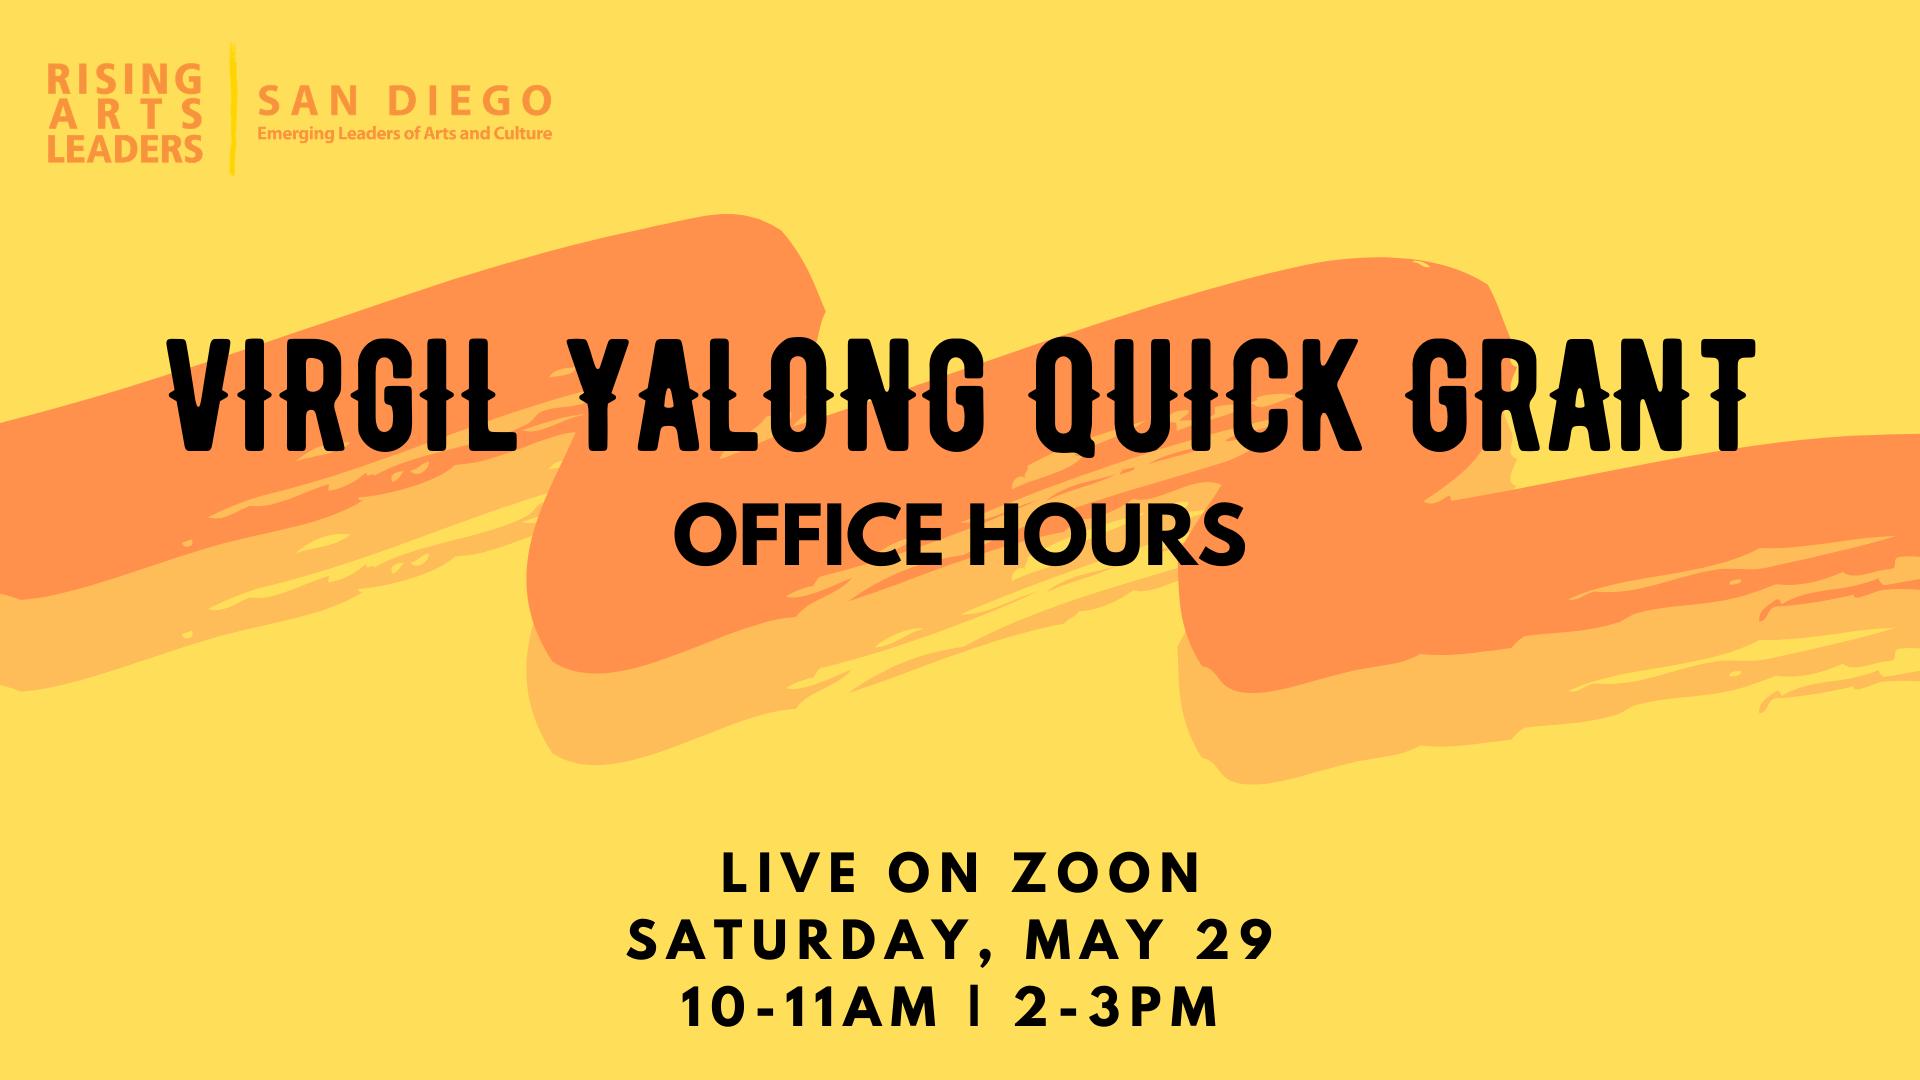 Virgil Yalong Quick Grants